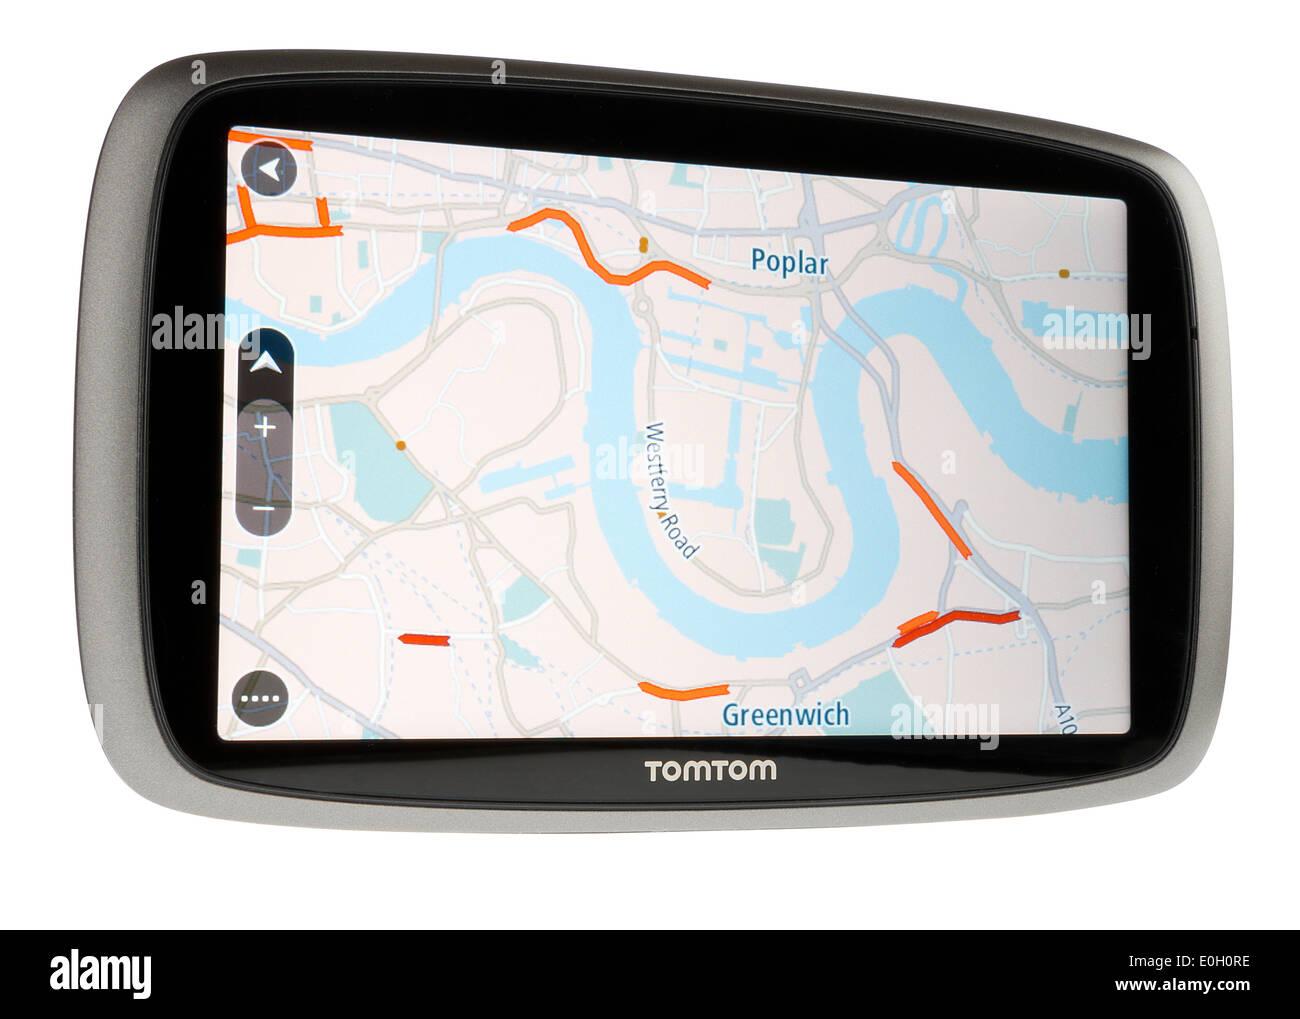 TomTom satellite navigation product - Stock Image